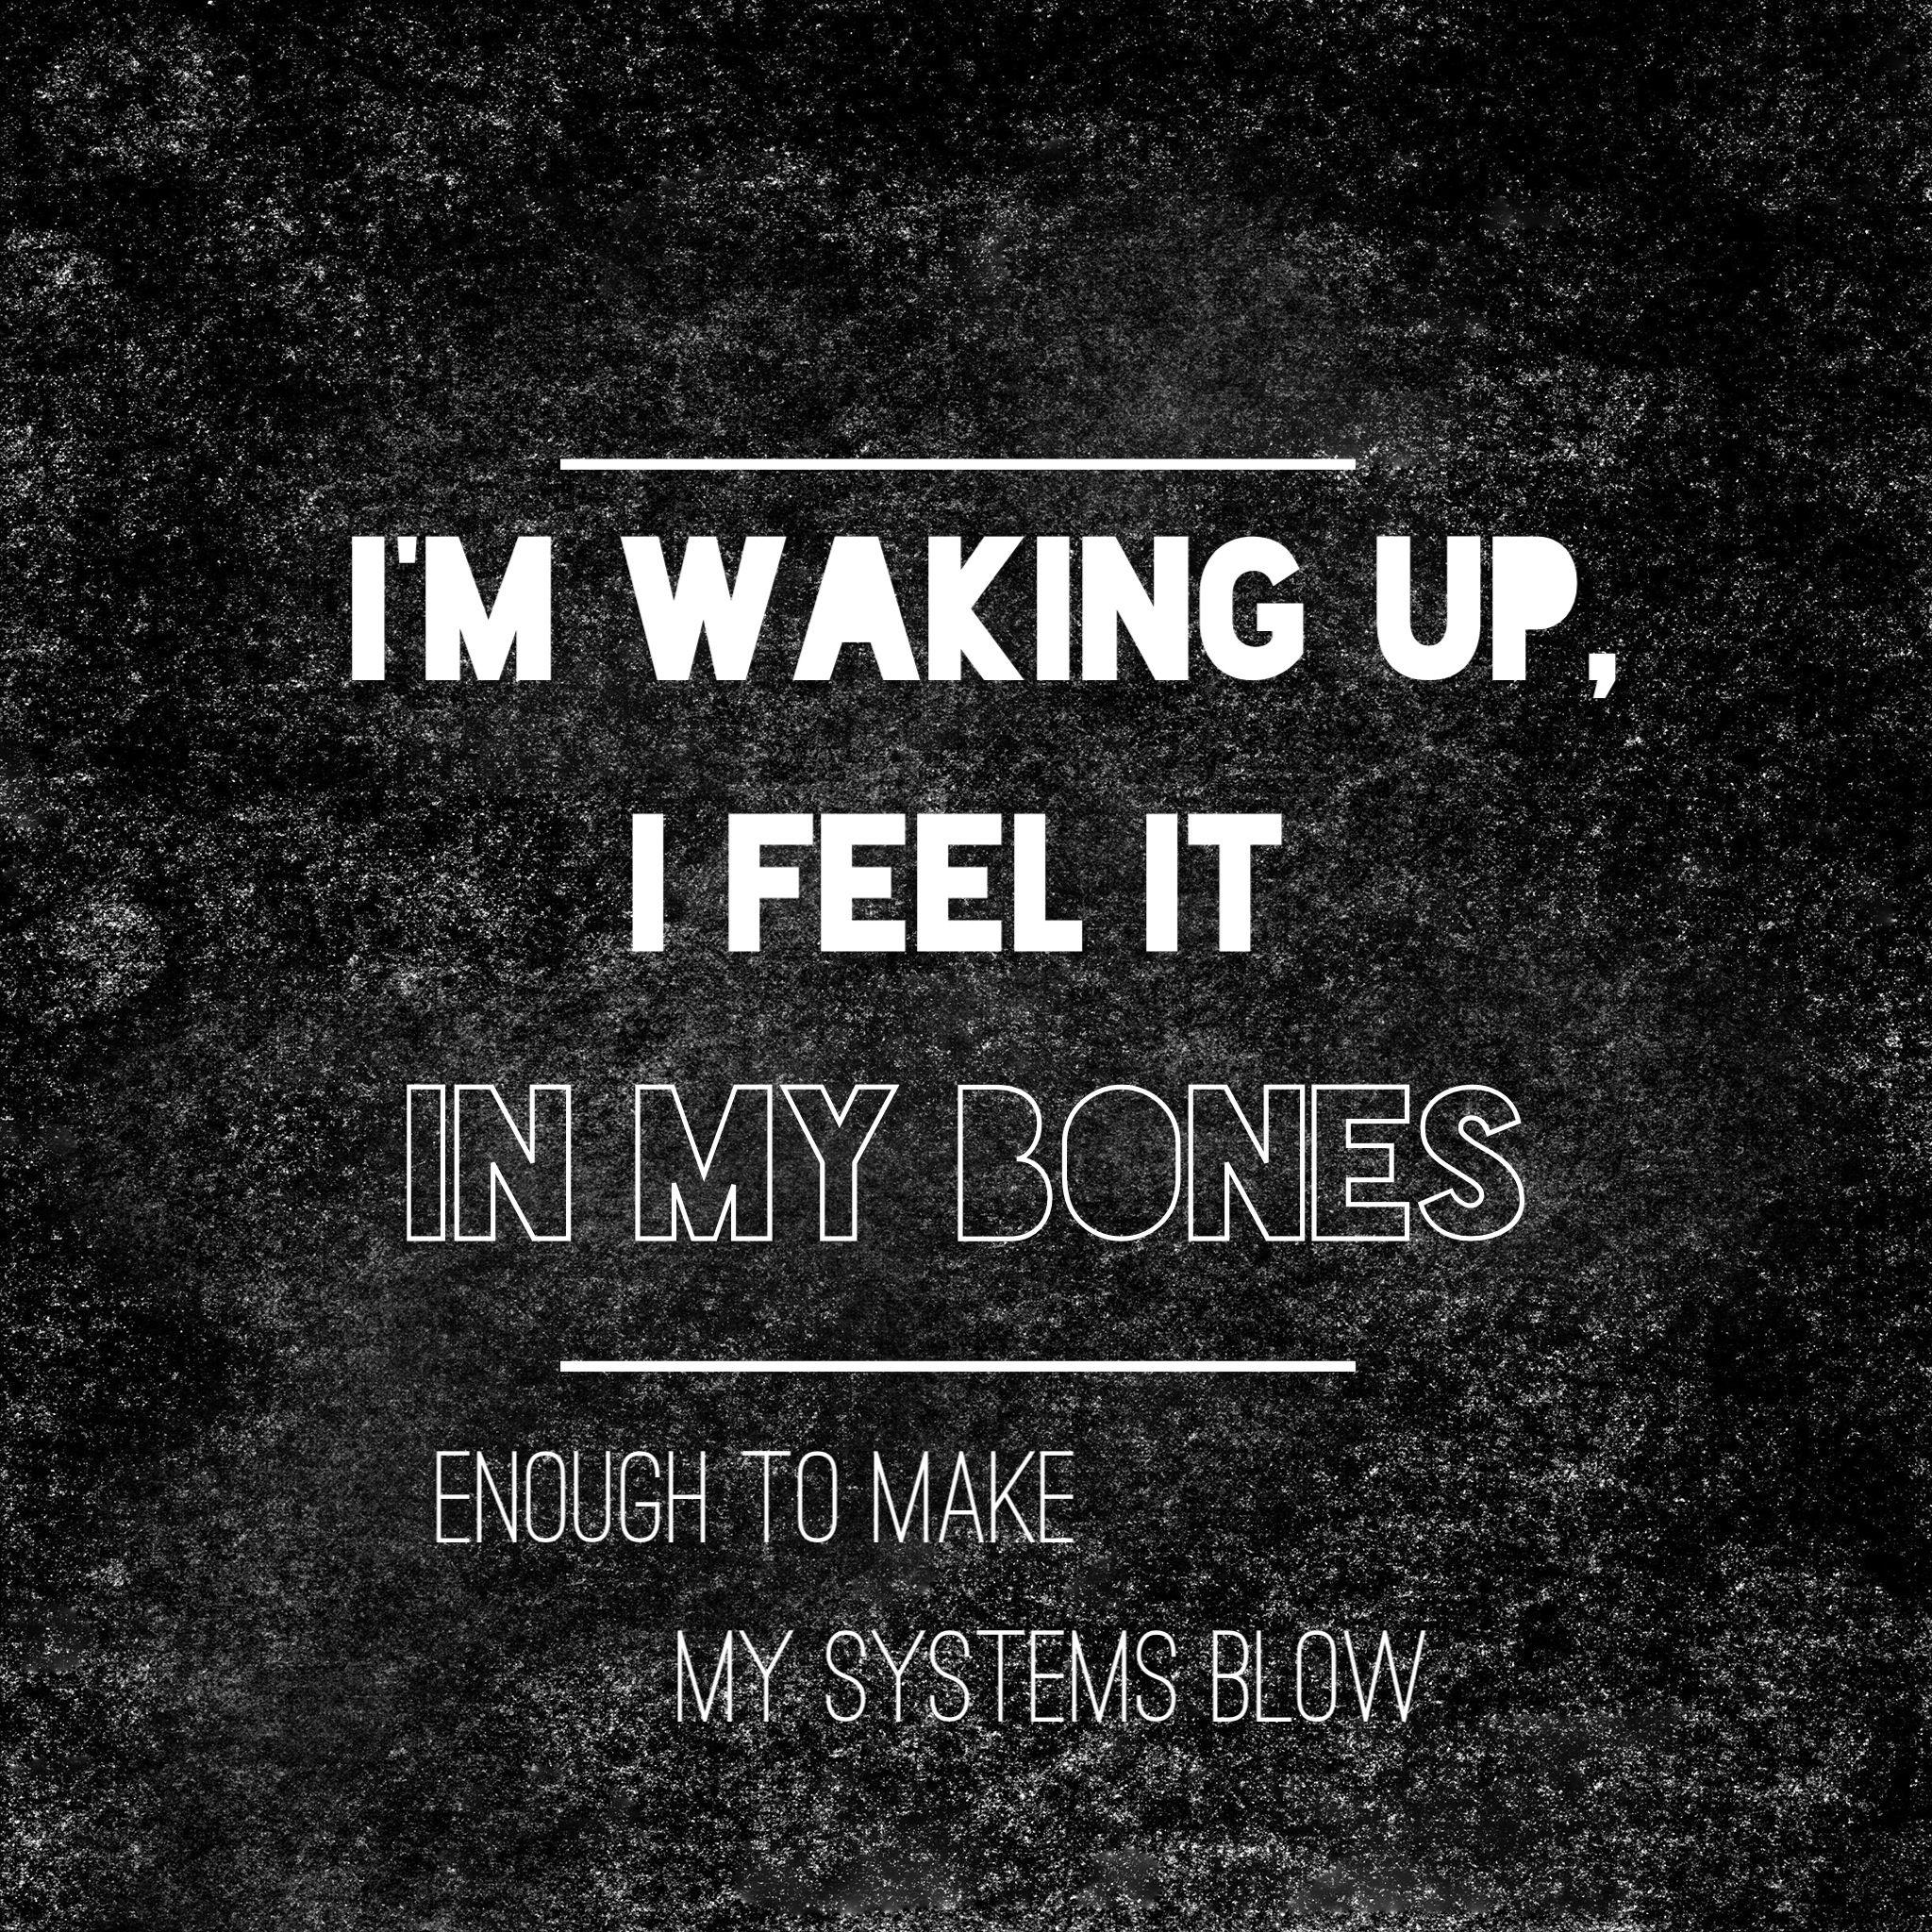 Radioactive by Imagine Dragons lyrics quote I made ...